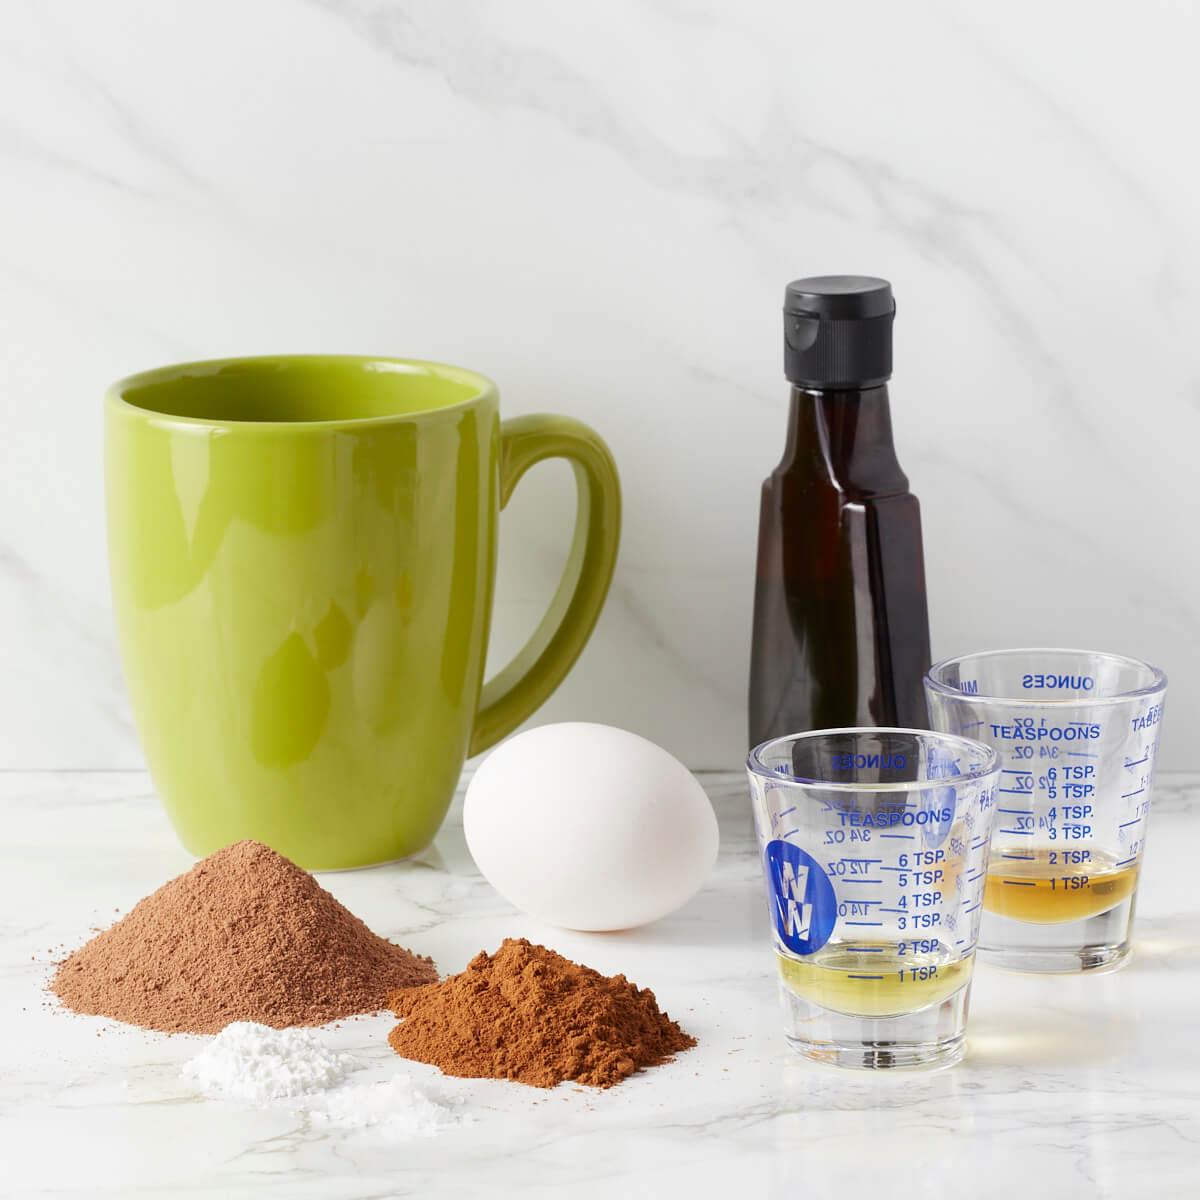 Glass Mini Measure Cup - lifestyle 2